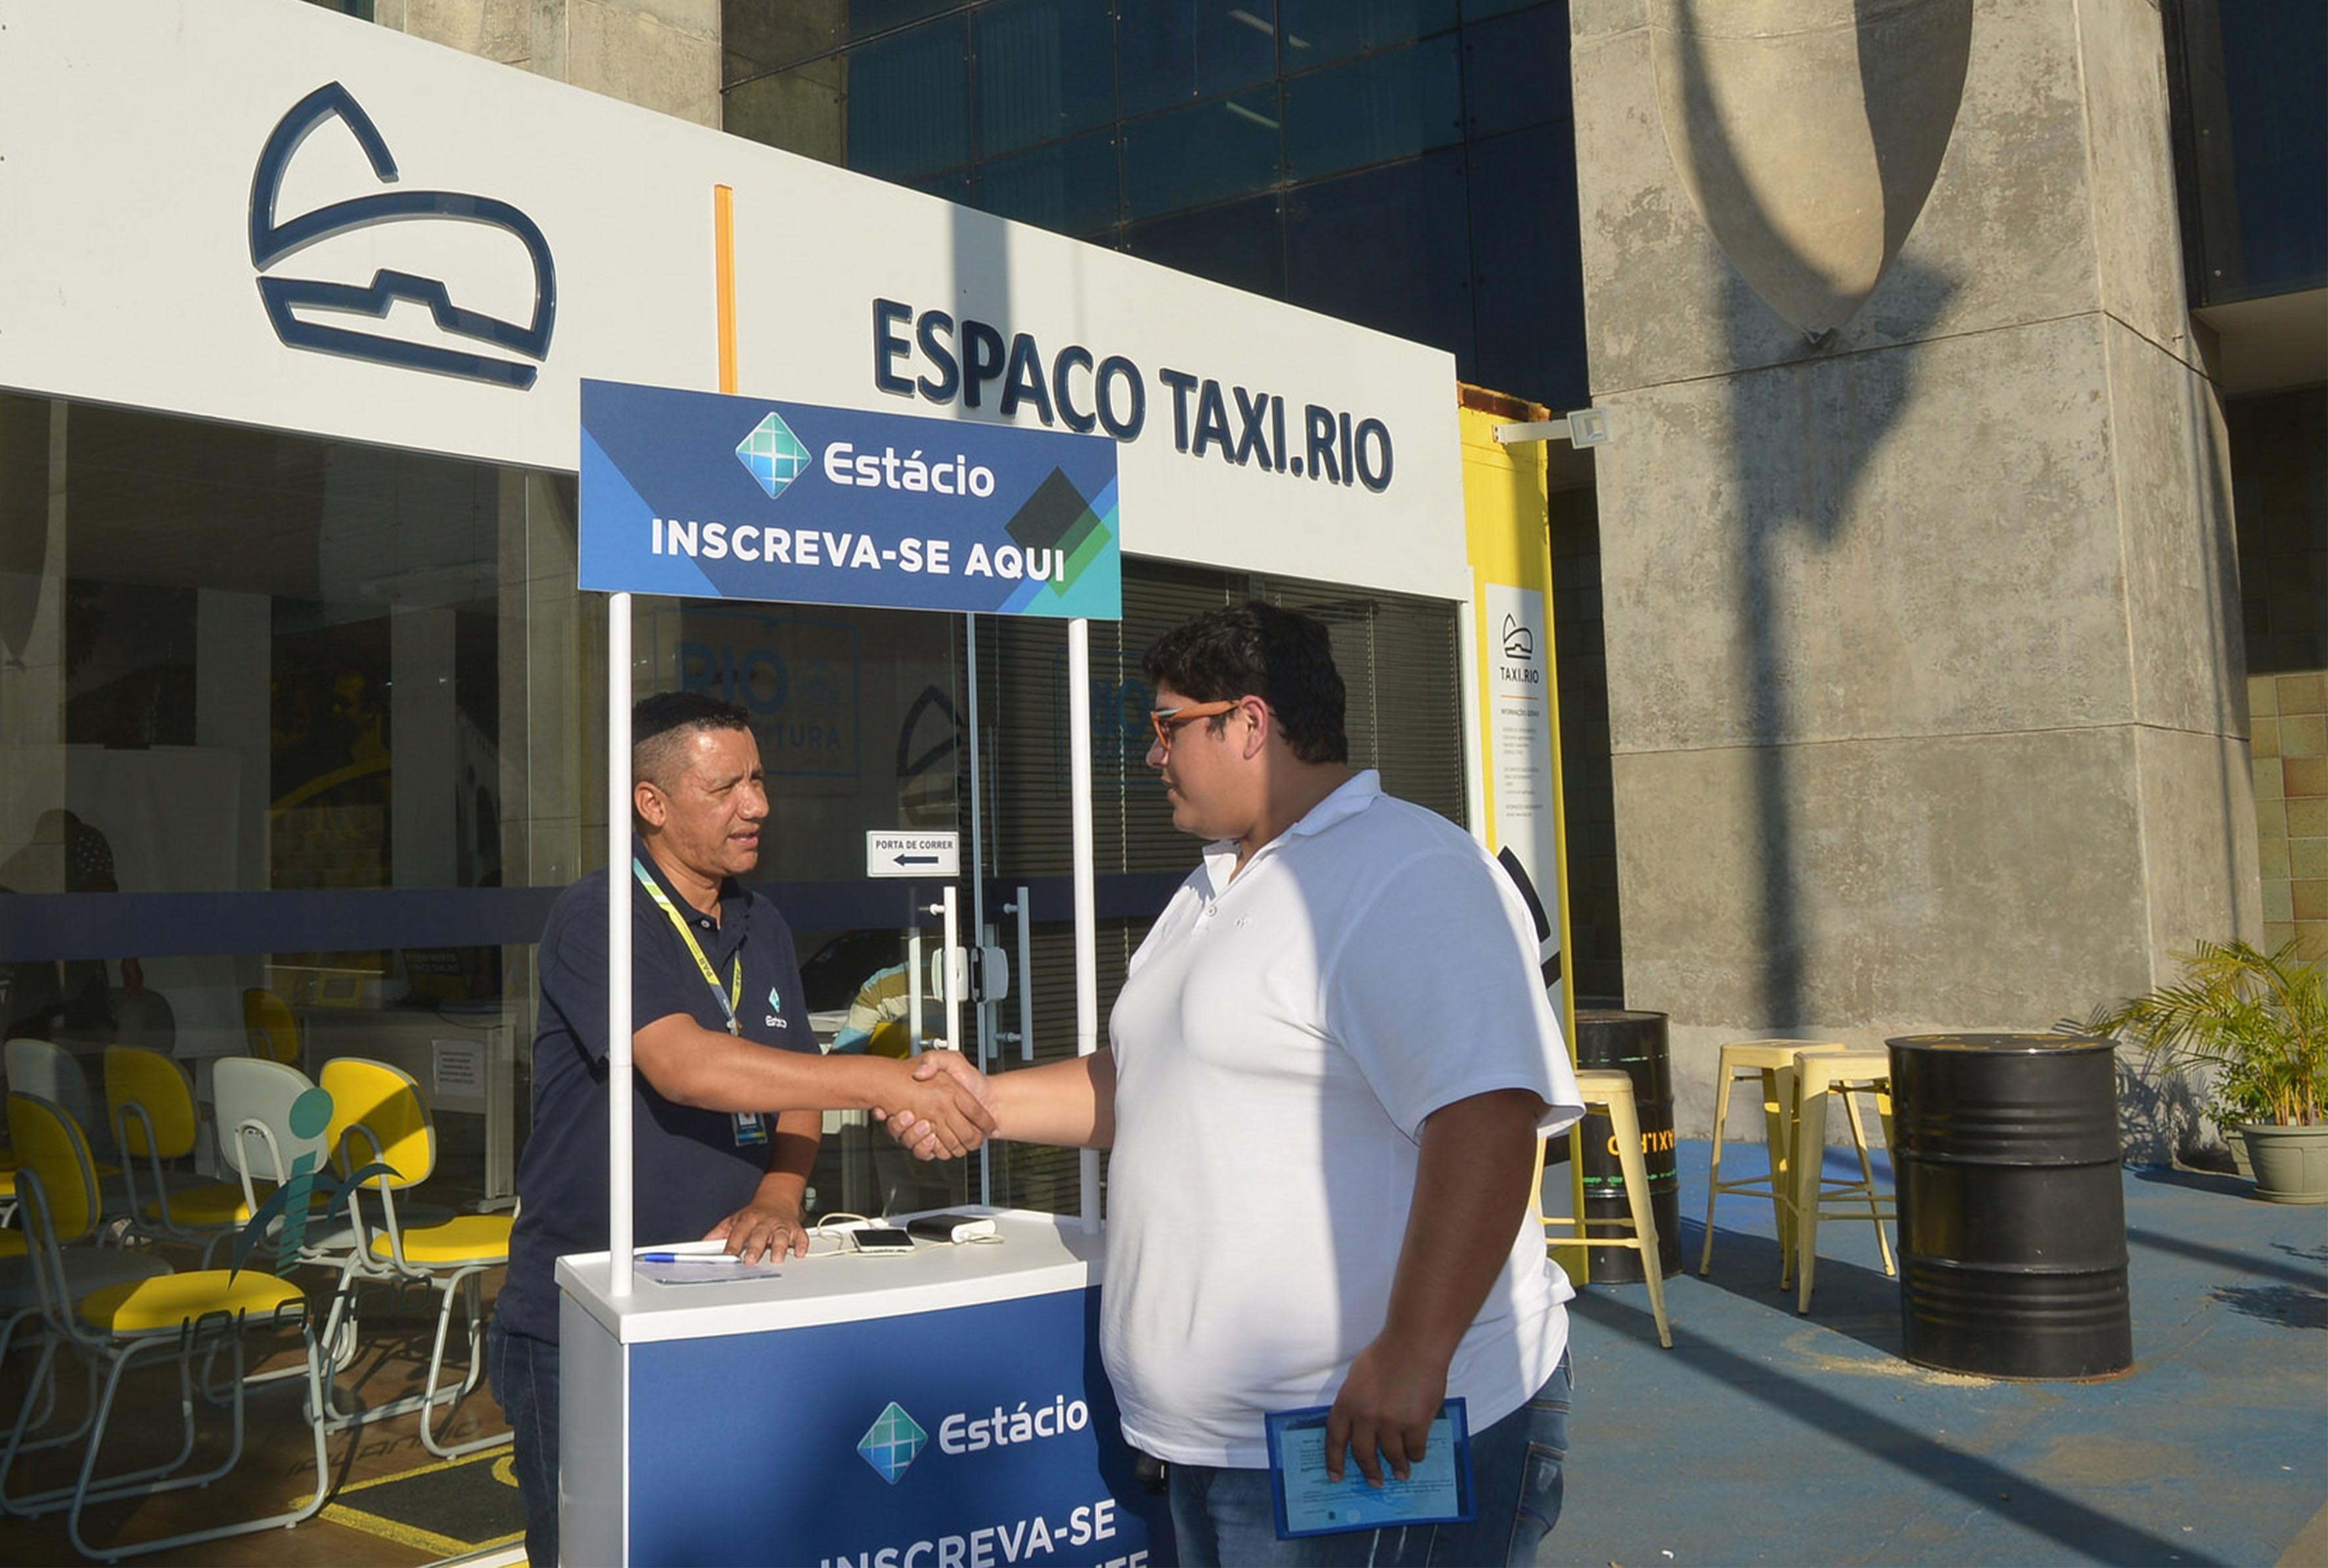 Taxi.Rio: Parceria com universidade dá 40% de desconto a taxistas no Ensino Superior